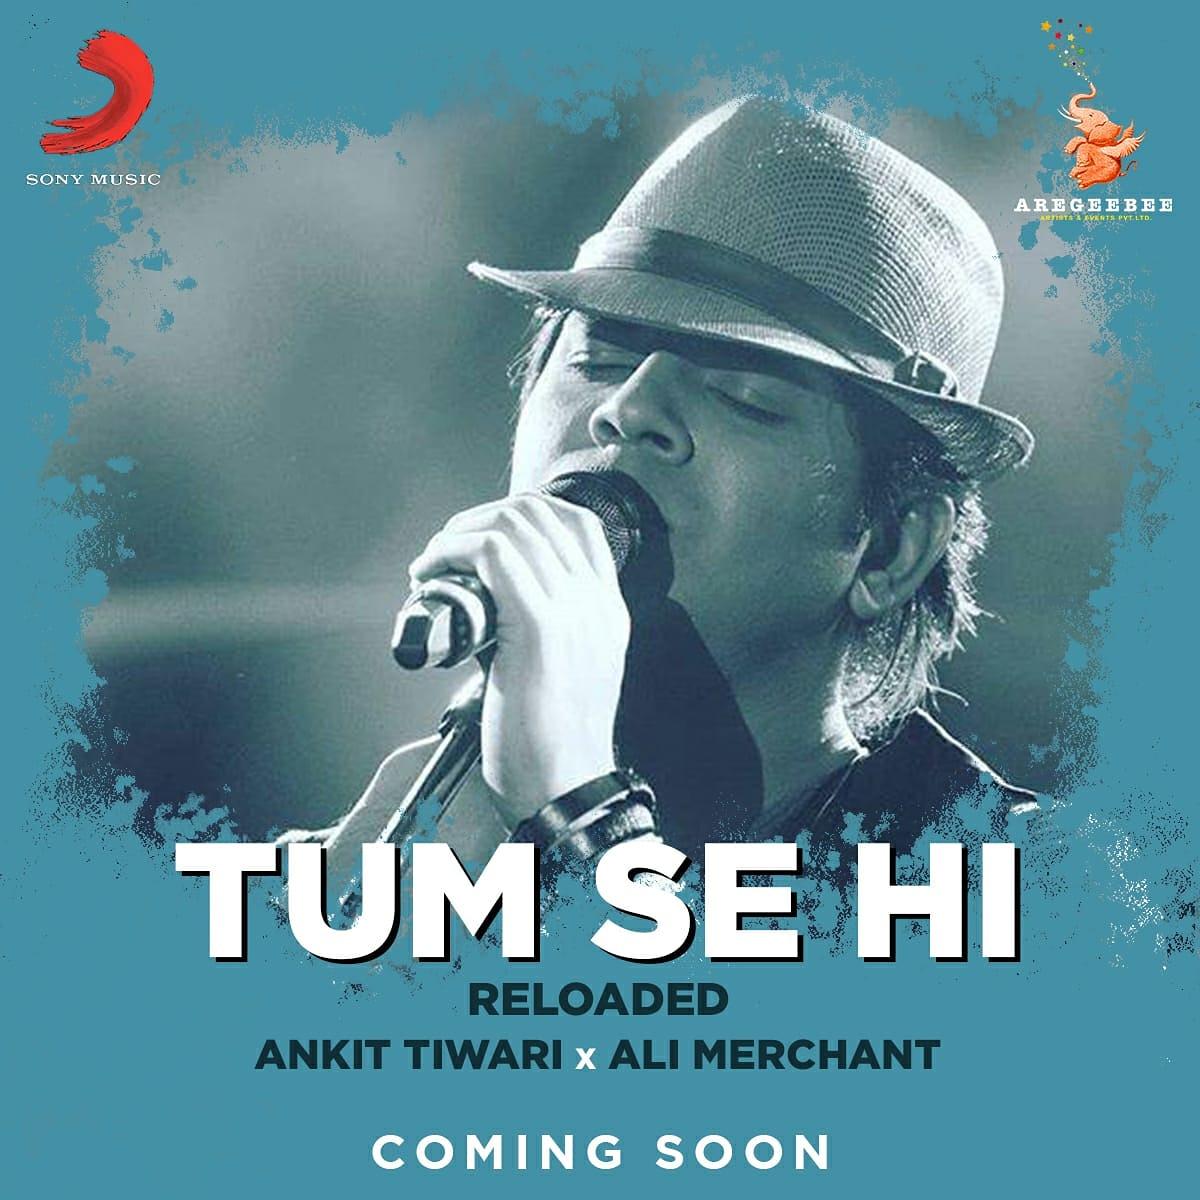 This new year, experience the magic of love with the all new Tum Se Hi by Ankit Tiwari and Ali Merchant✨  #tumsehi #comingsoon  @officiallyAnkit @AliAMerchant @shabbirahmed @aliaa08 @PoojaB1972 @MaheshNBhatt @VisheshFilms @duttsanjay #AdityaRoyKapur #leenabose @rhythm_shaw